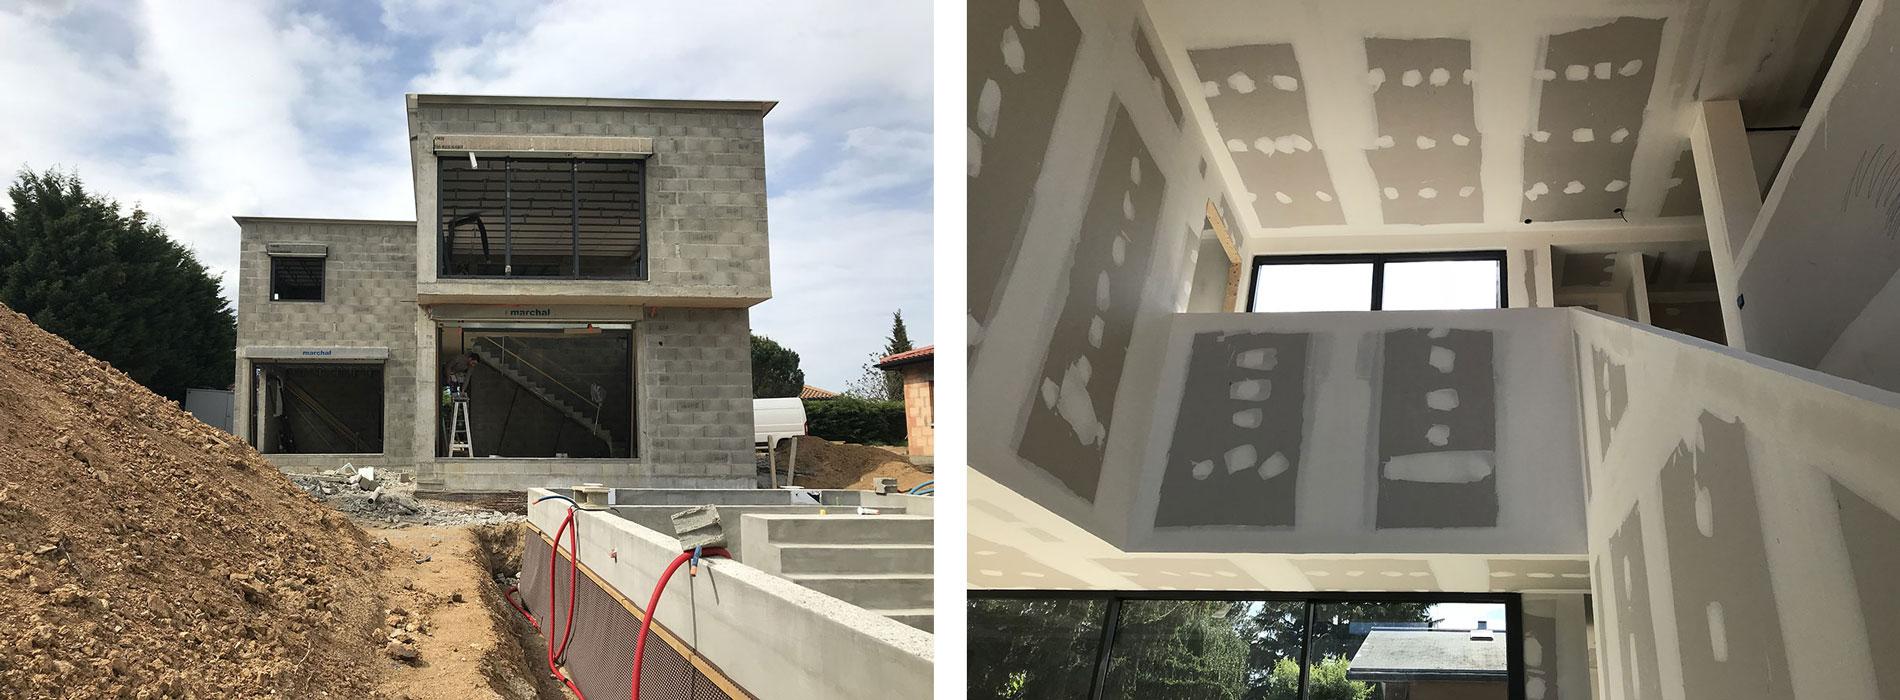 asb-architecture-maison-contemporaine-toiture-terrasse-chantier